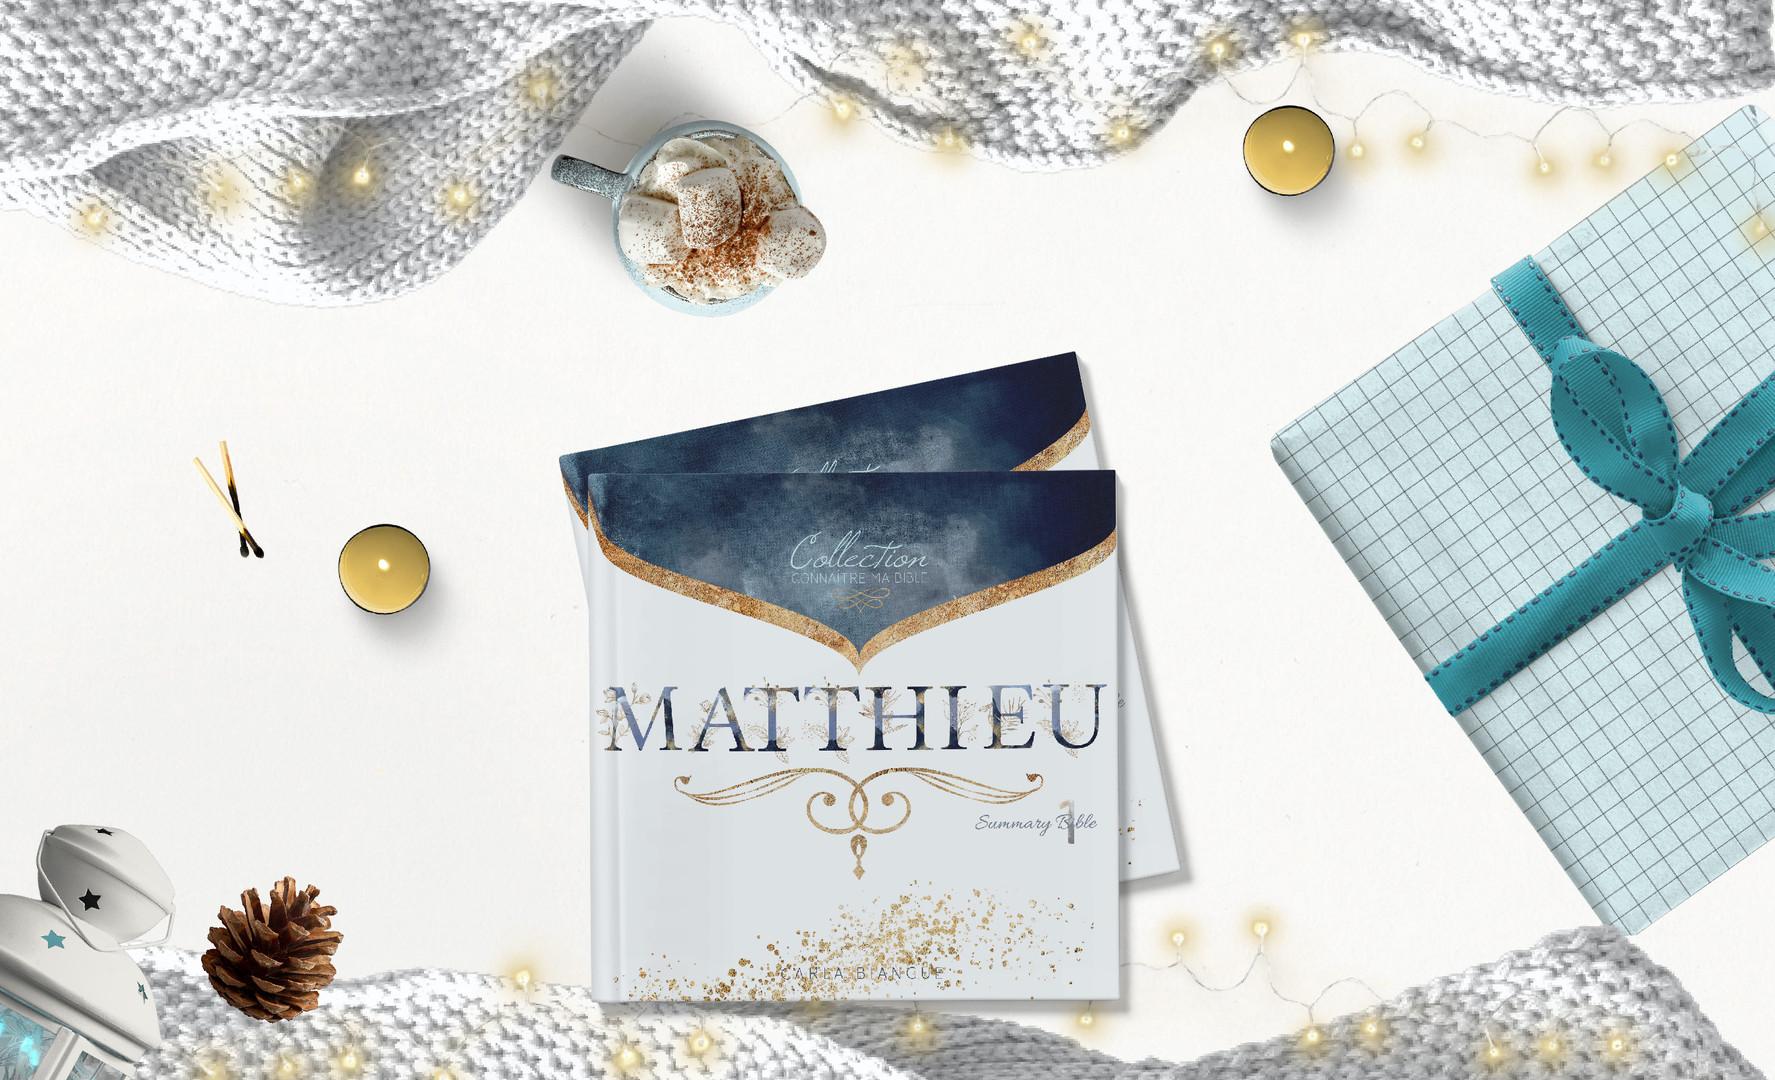 Summary Bible - Matthieu